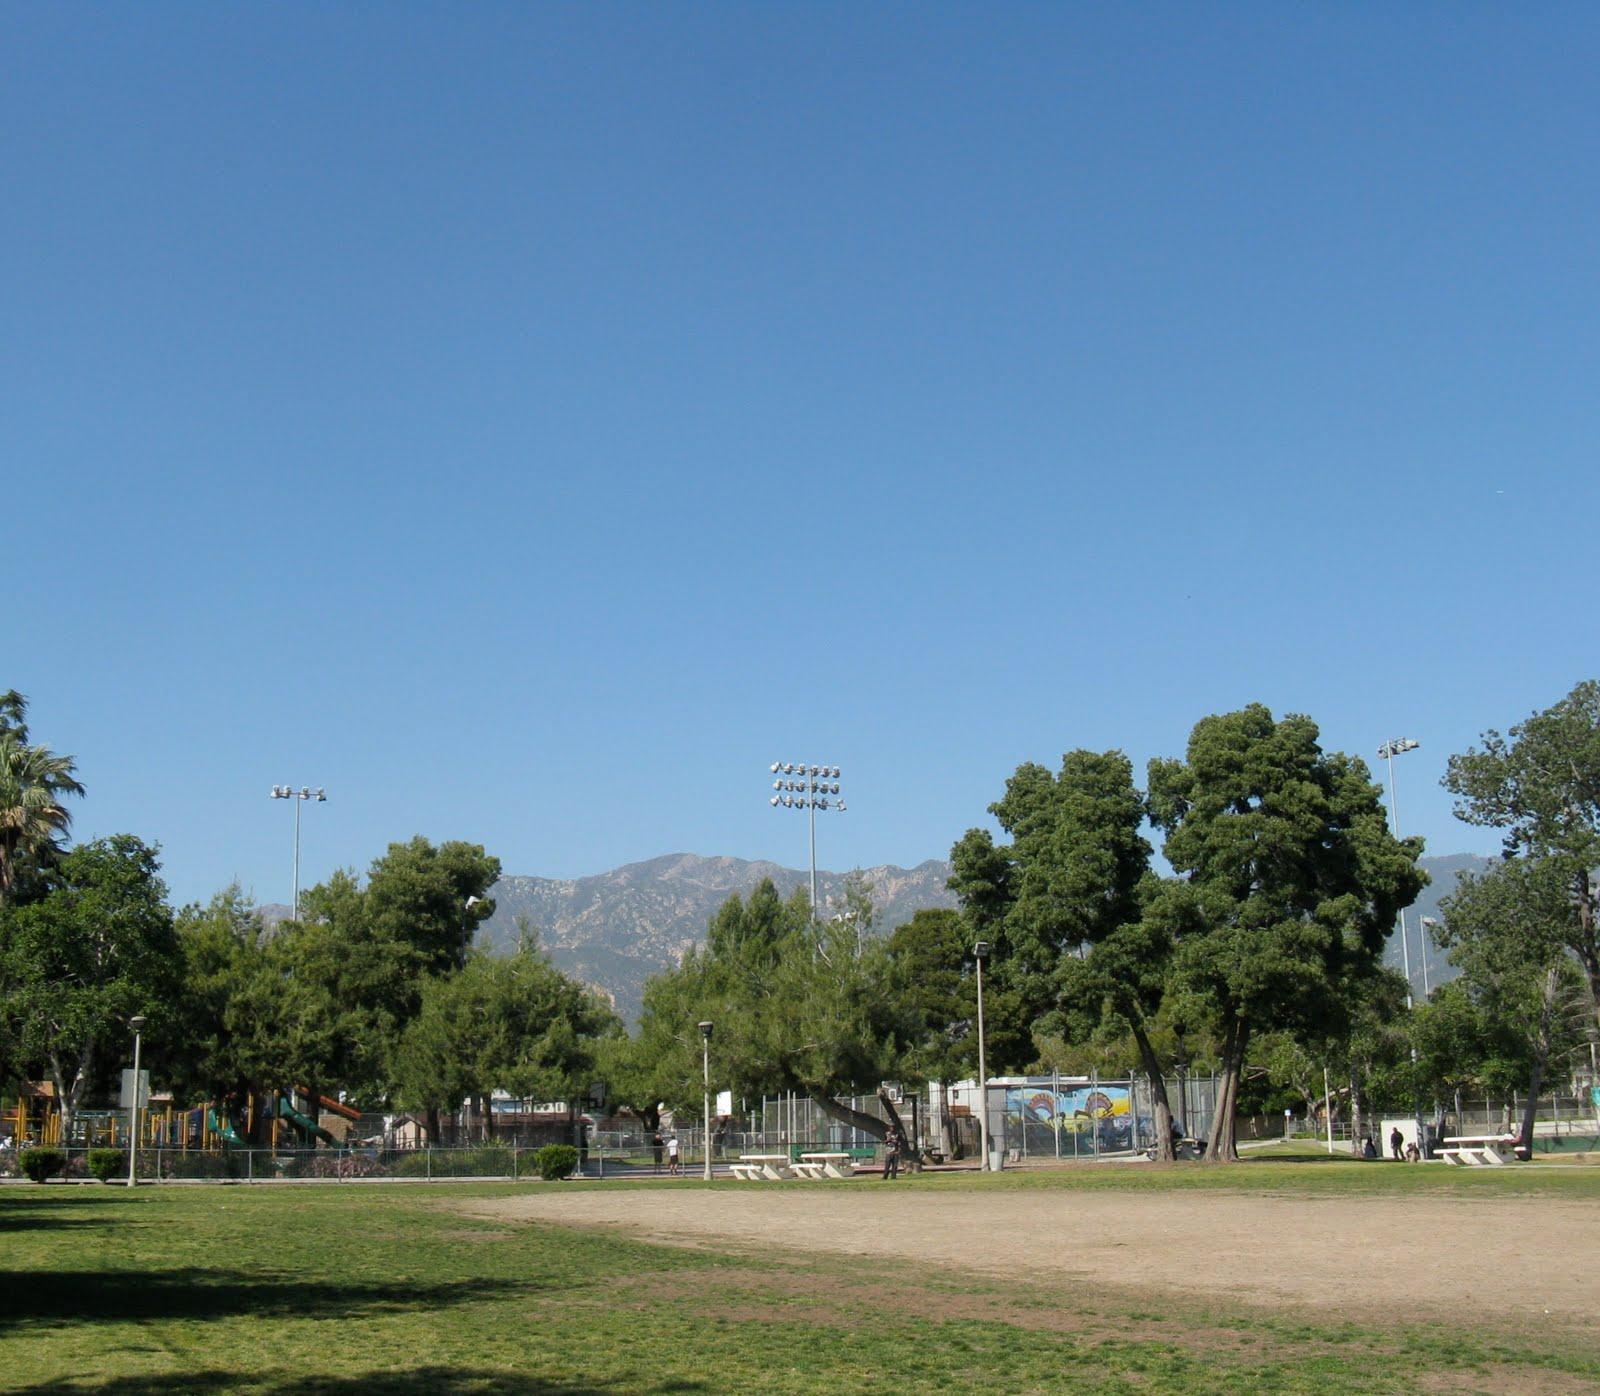 The Sky Is Big In Pasadena Skywatching At Villa Park